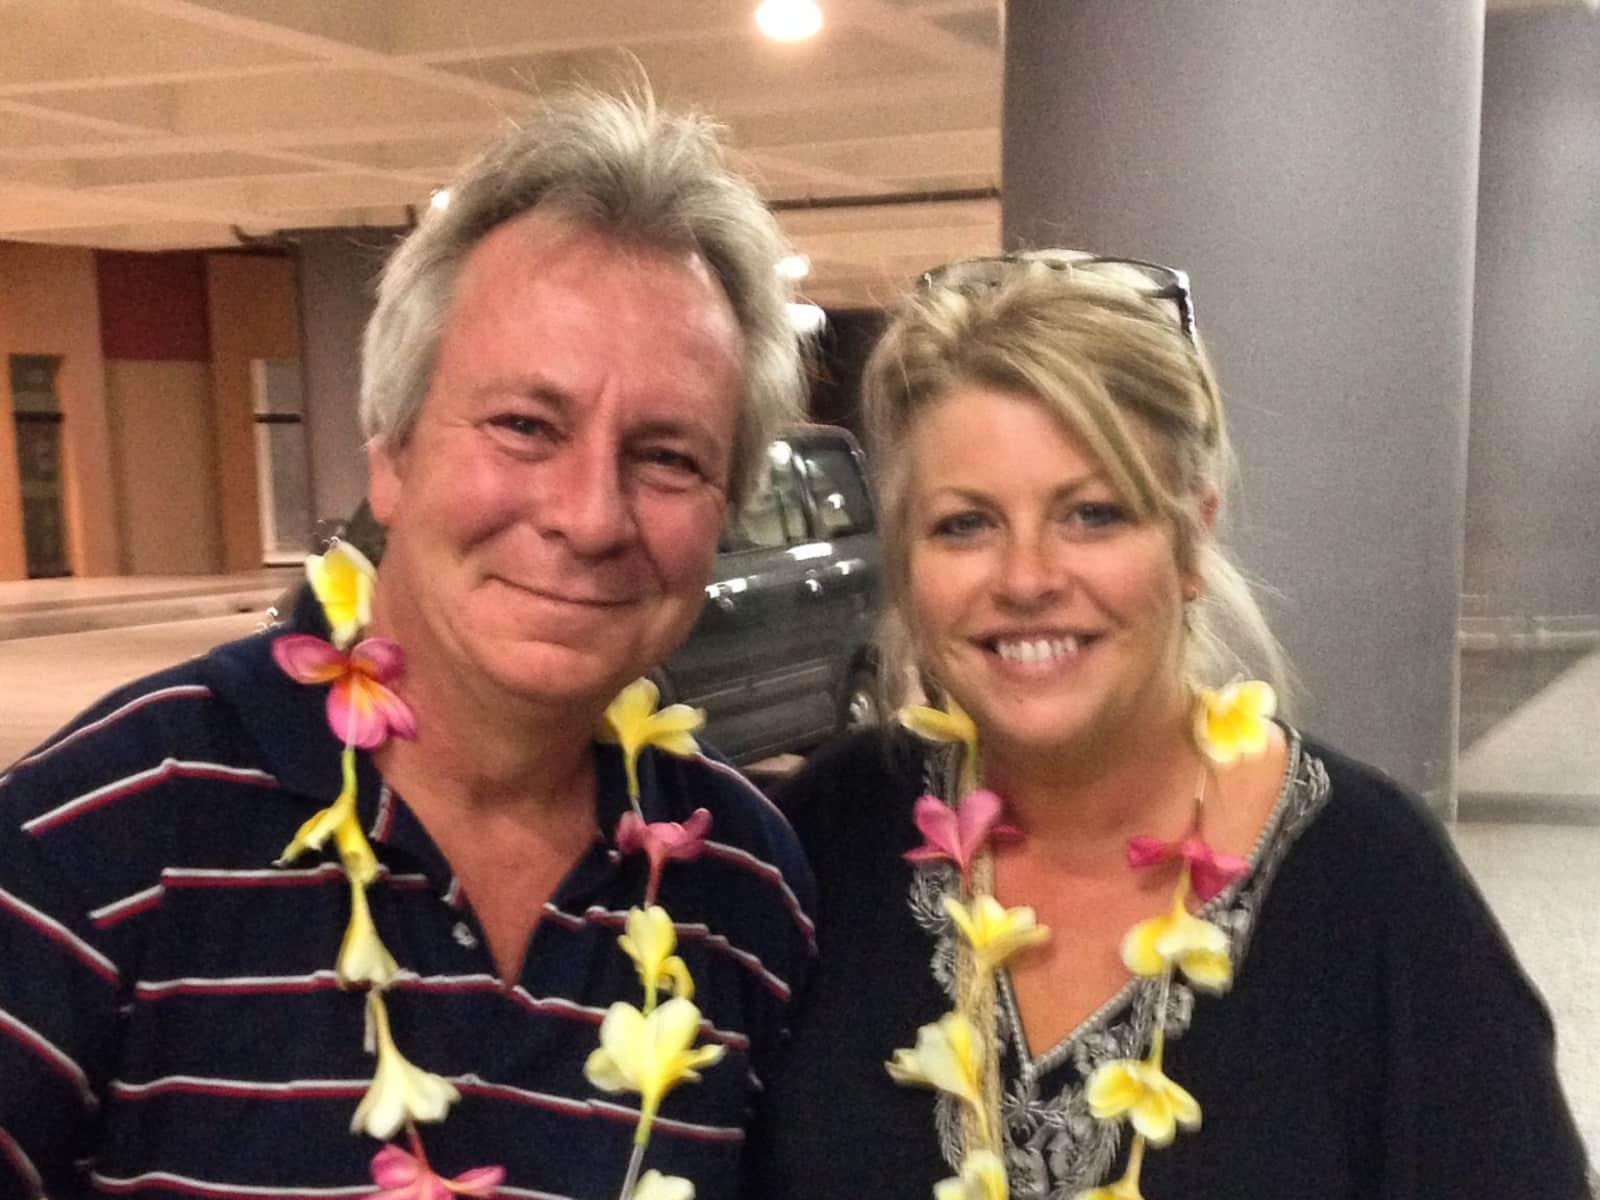 Rachel & Kent from Perth, Western Australia, Australia